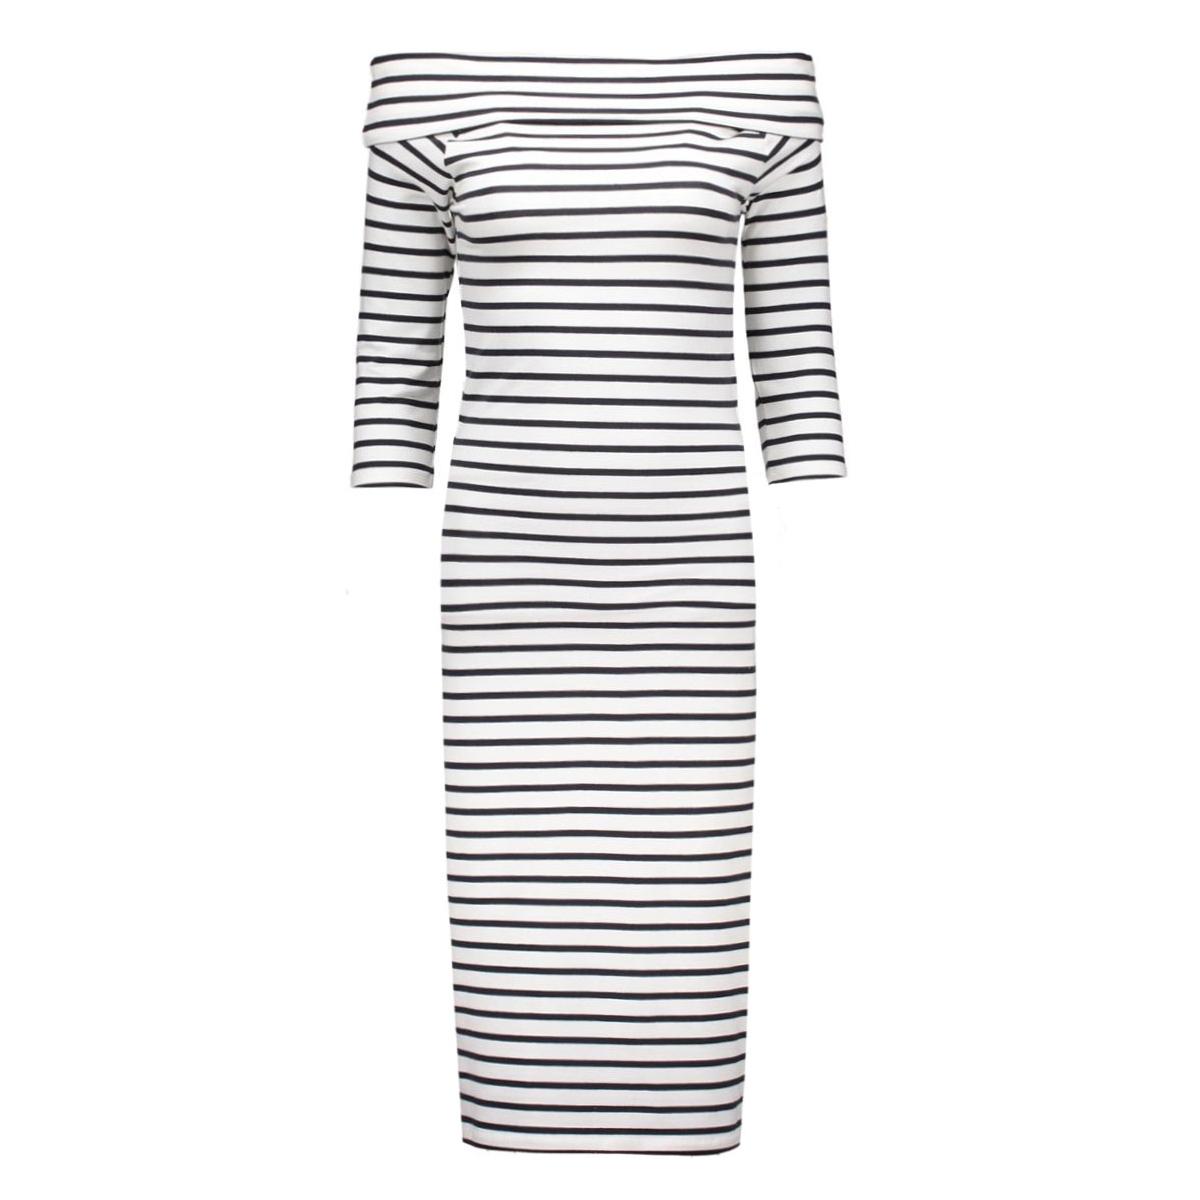 jdystripy 3/4 dress 15125967 jacqueline de yong jurk